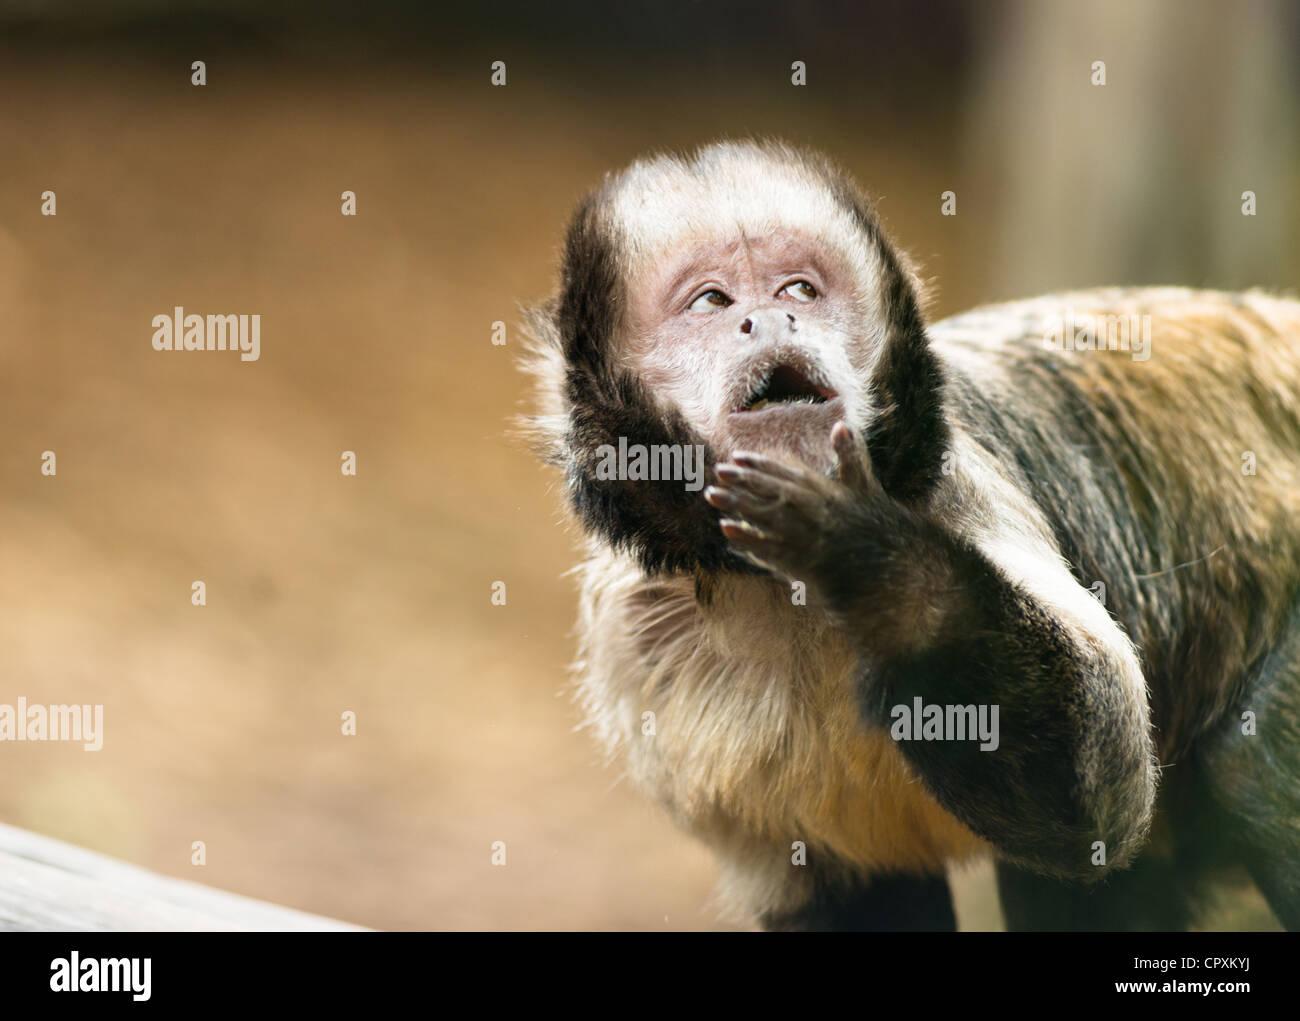 Singe capucin touffetée (Sapajus) avec expression apella chauds. Photo Stock